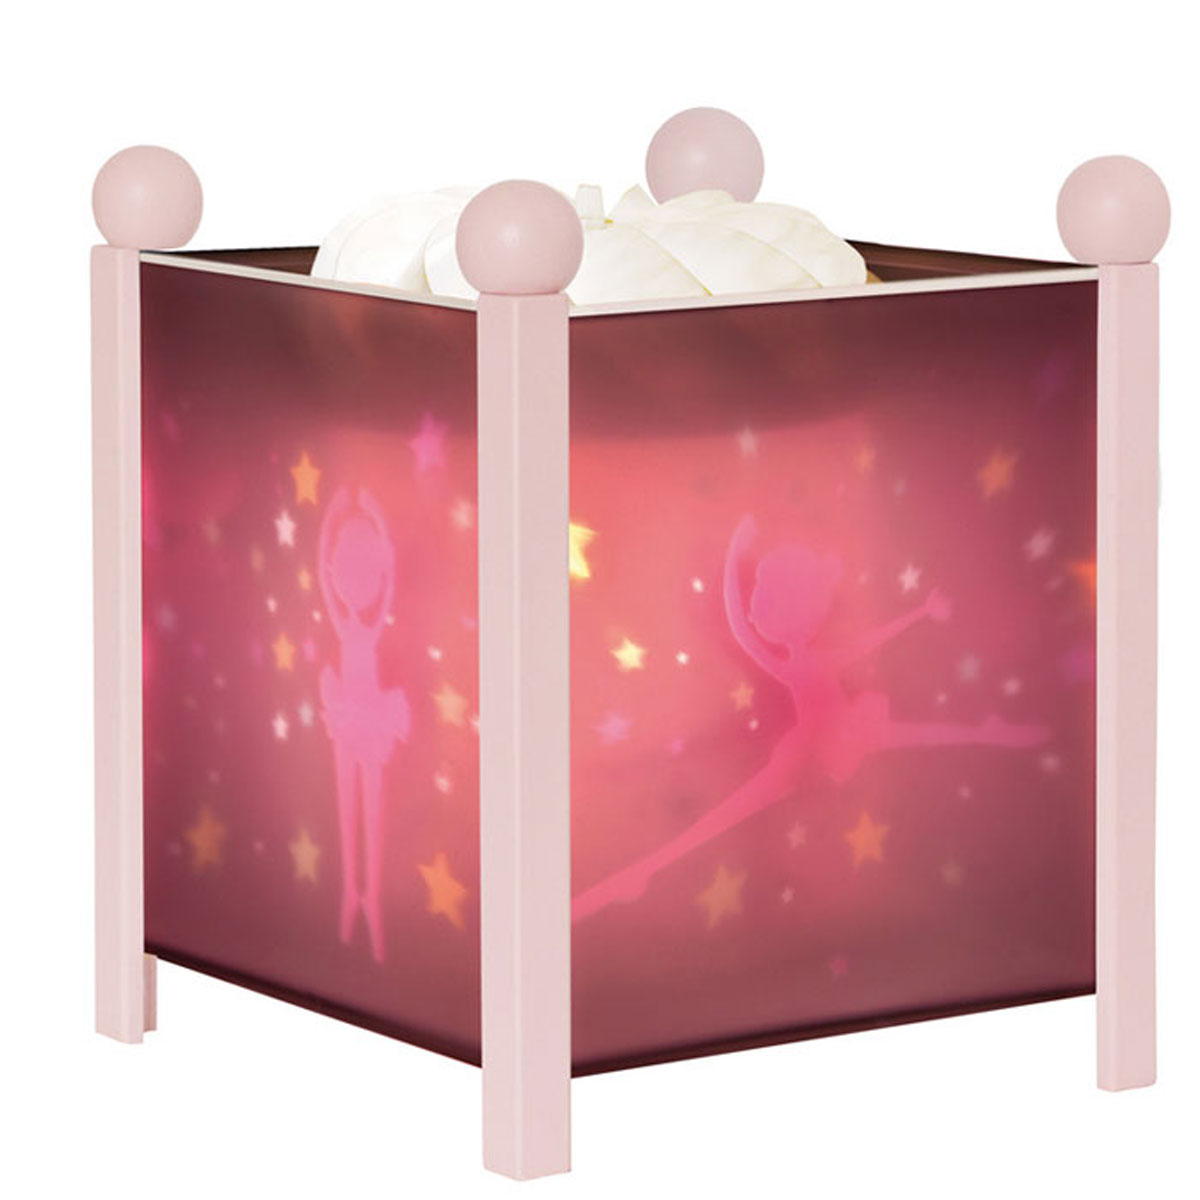 Trousselier Светильник-ночник Magic Lantern Ballerina цвет розовый